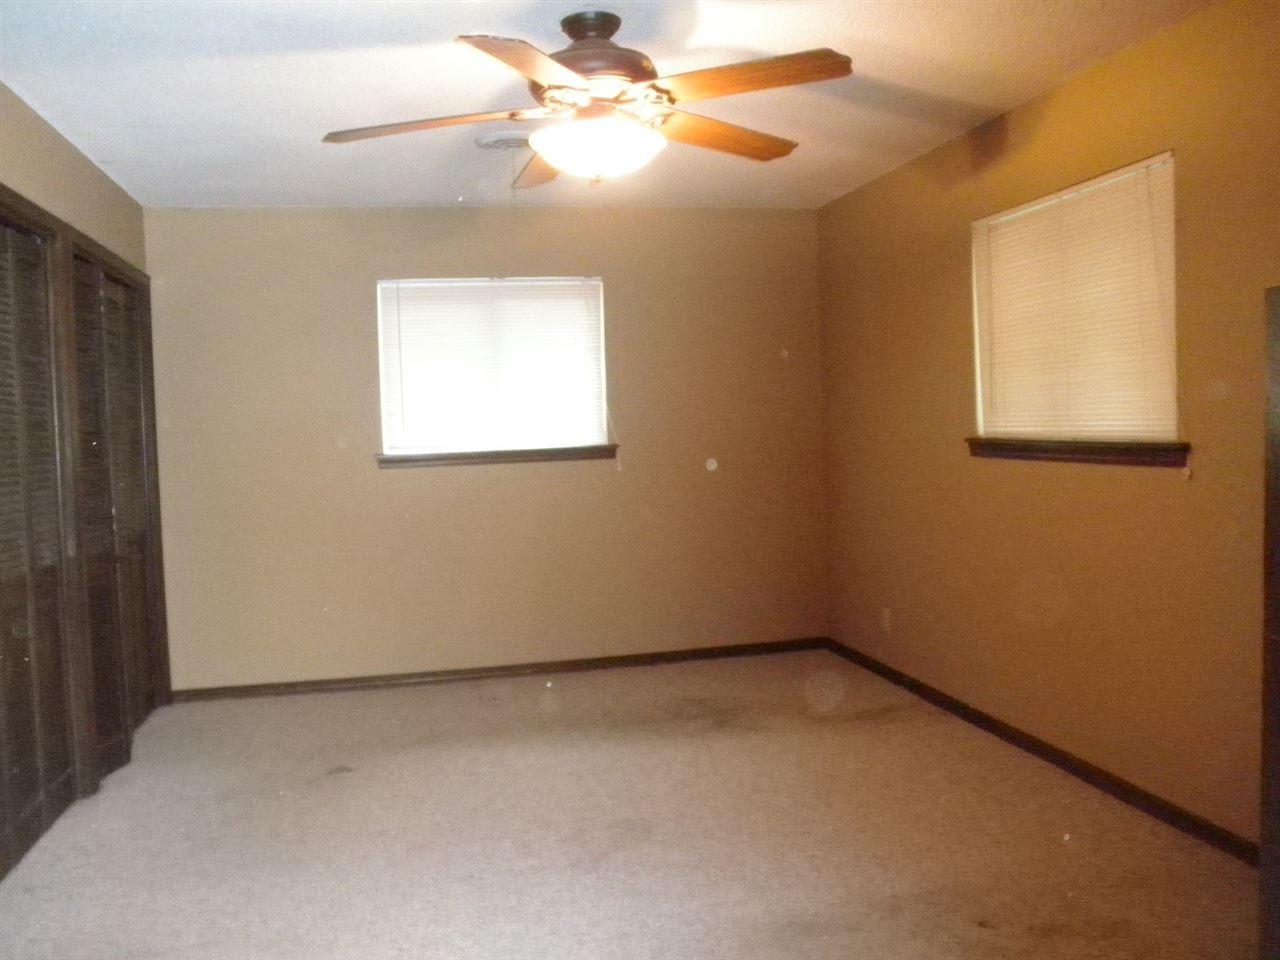 Sold Cross Sale W/ MLS | 357 30 Road  Ponca City, OK 74604 8